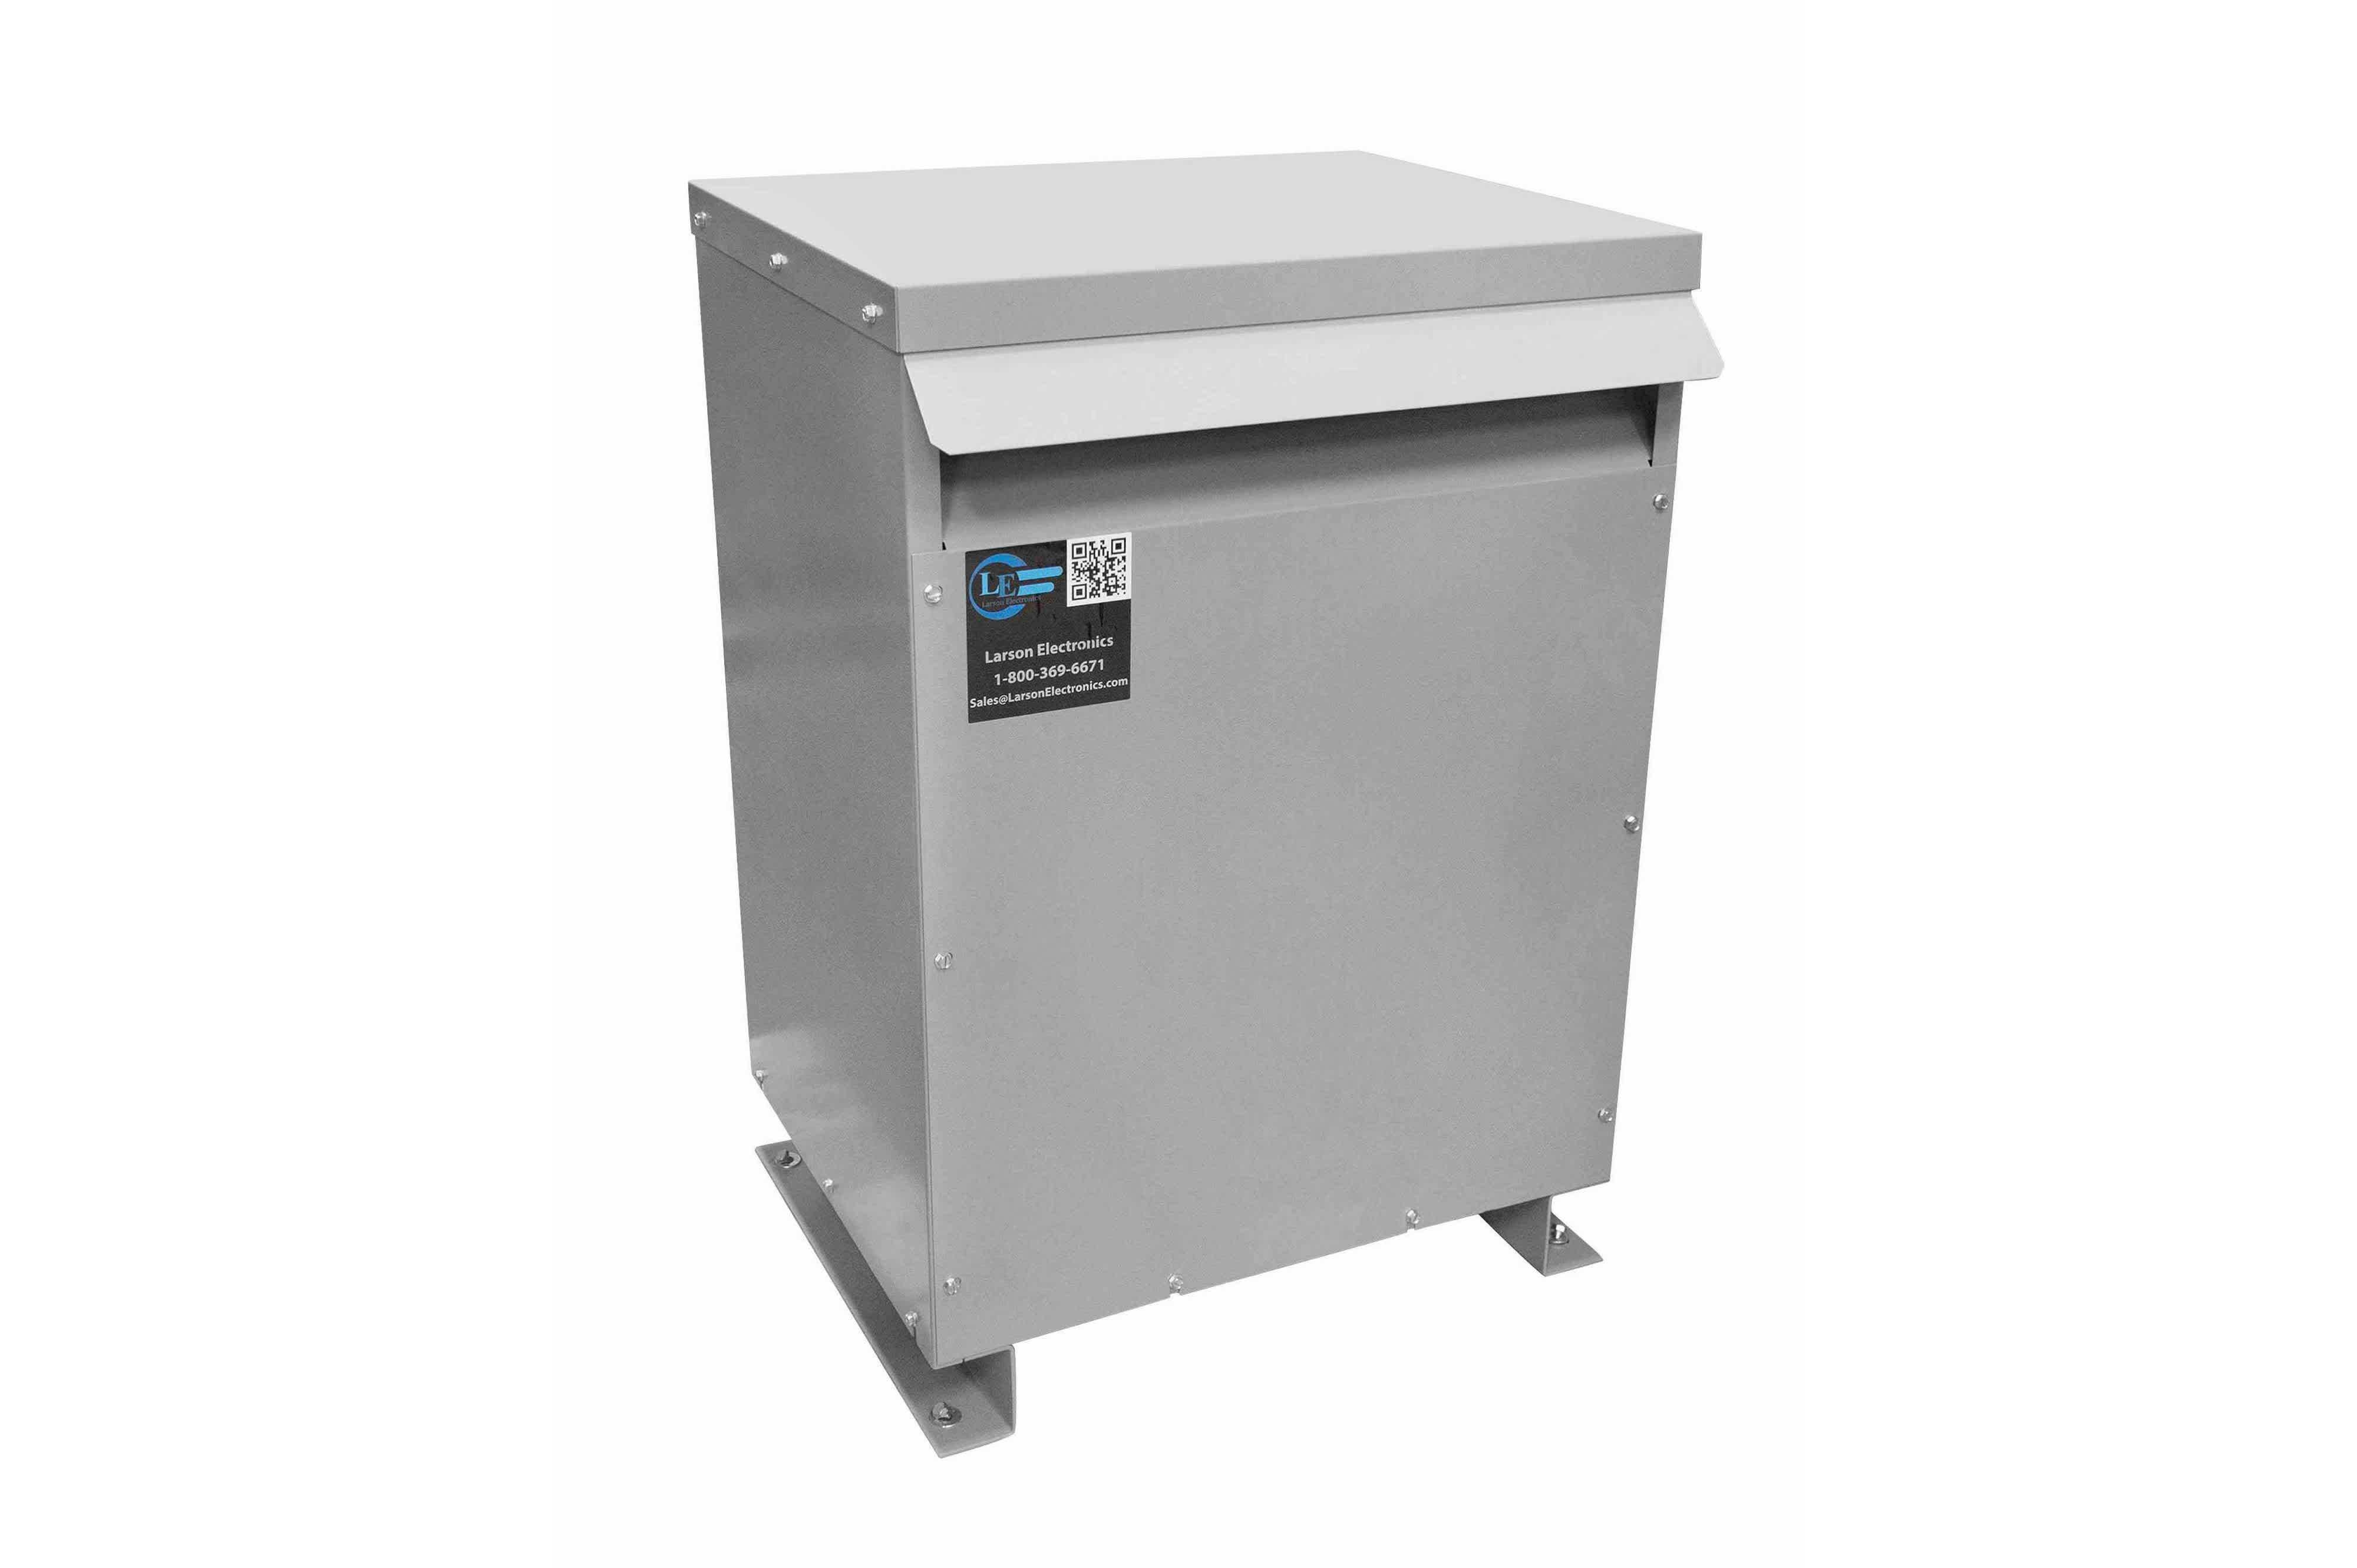 125 kVA 3PH Isolation Transformer, 380V Wye Primary, 480V Delta Secondary, N3R, Ventilated, 60 Hz